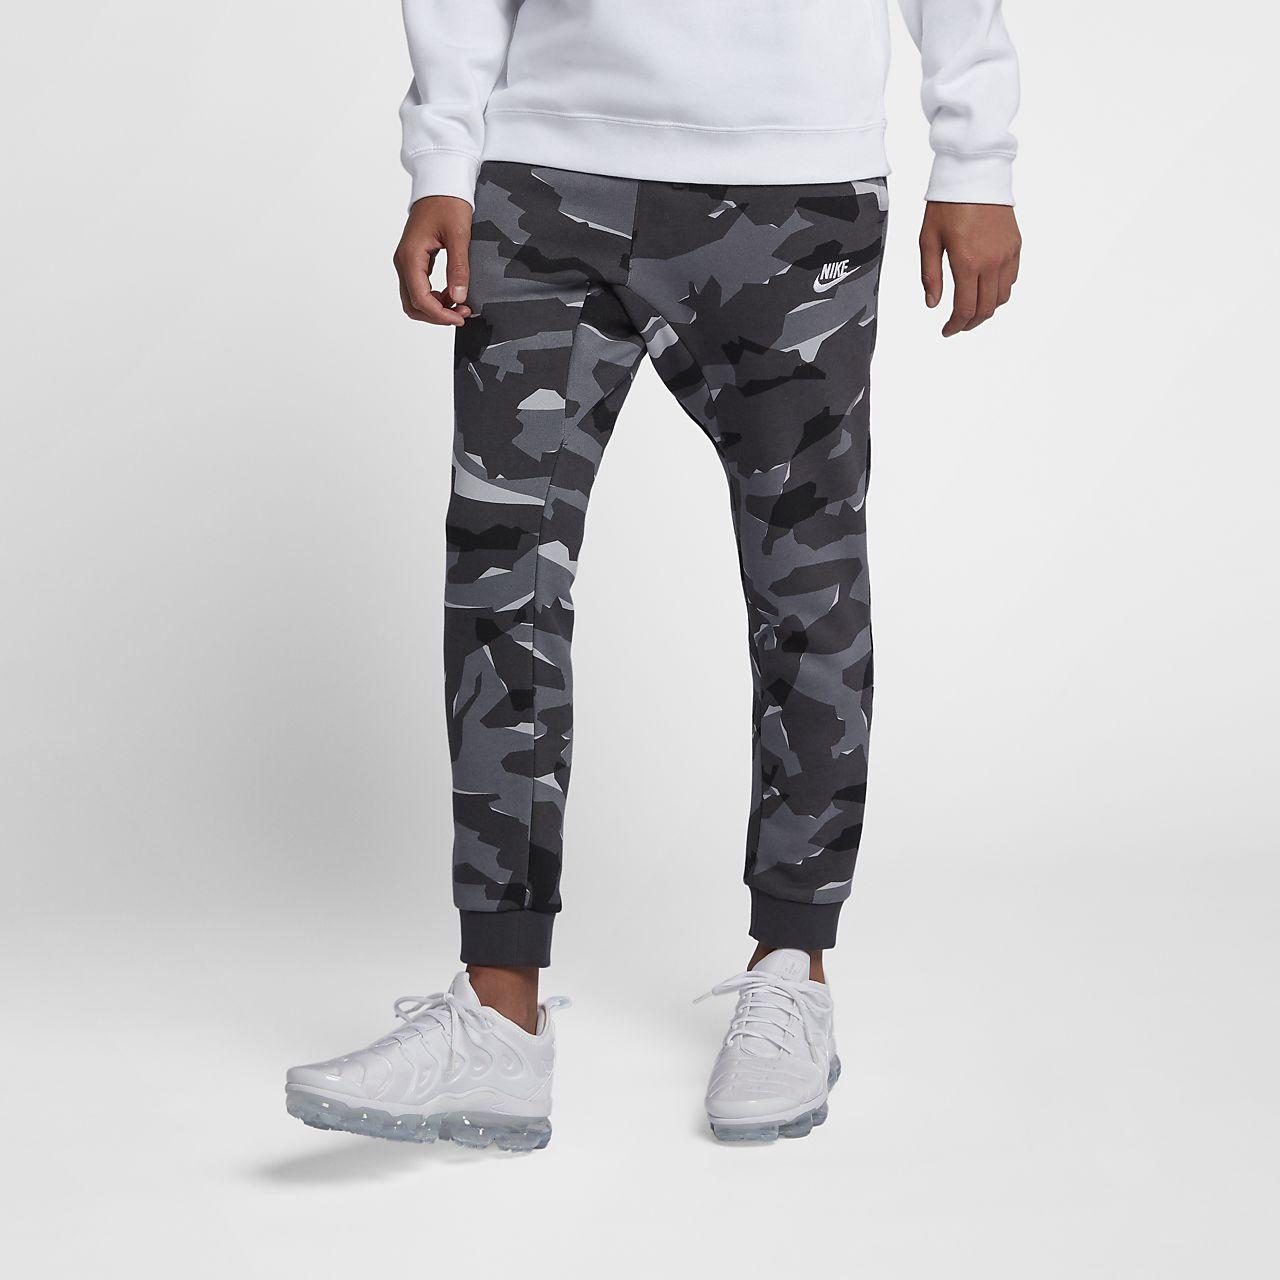 31ce2fda55da23 Nike Sportswear Club Men s Camo Joggers. Nike.com GB